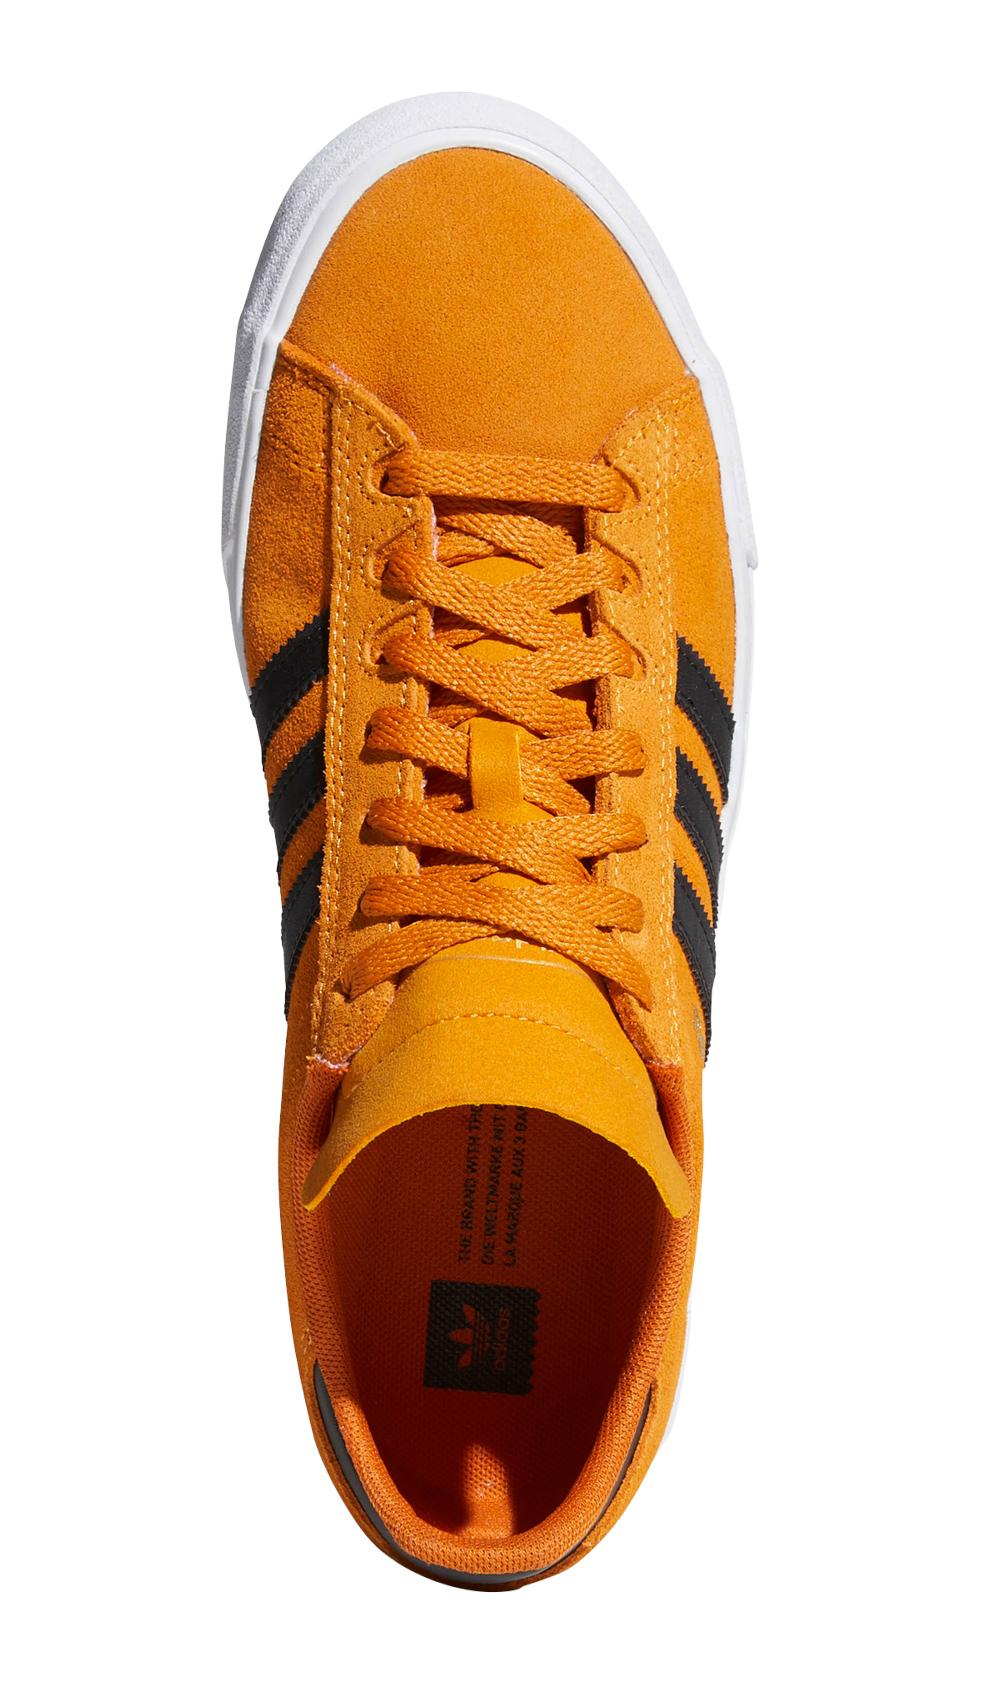 low priced dadcc d8bc3 ADIDAS-Skateboarding-Campus-Vulc-II-Skate-Shoes-Scarpe-